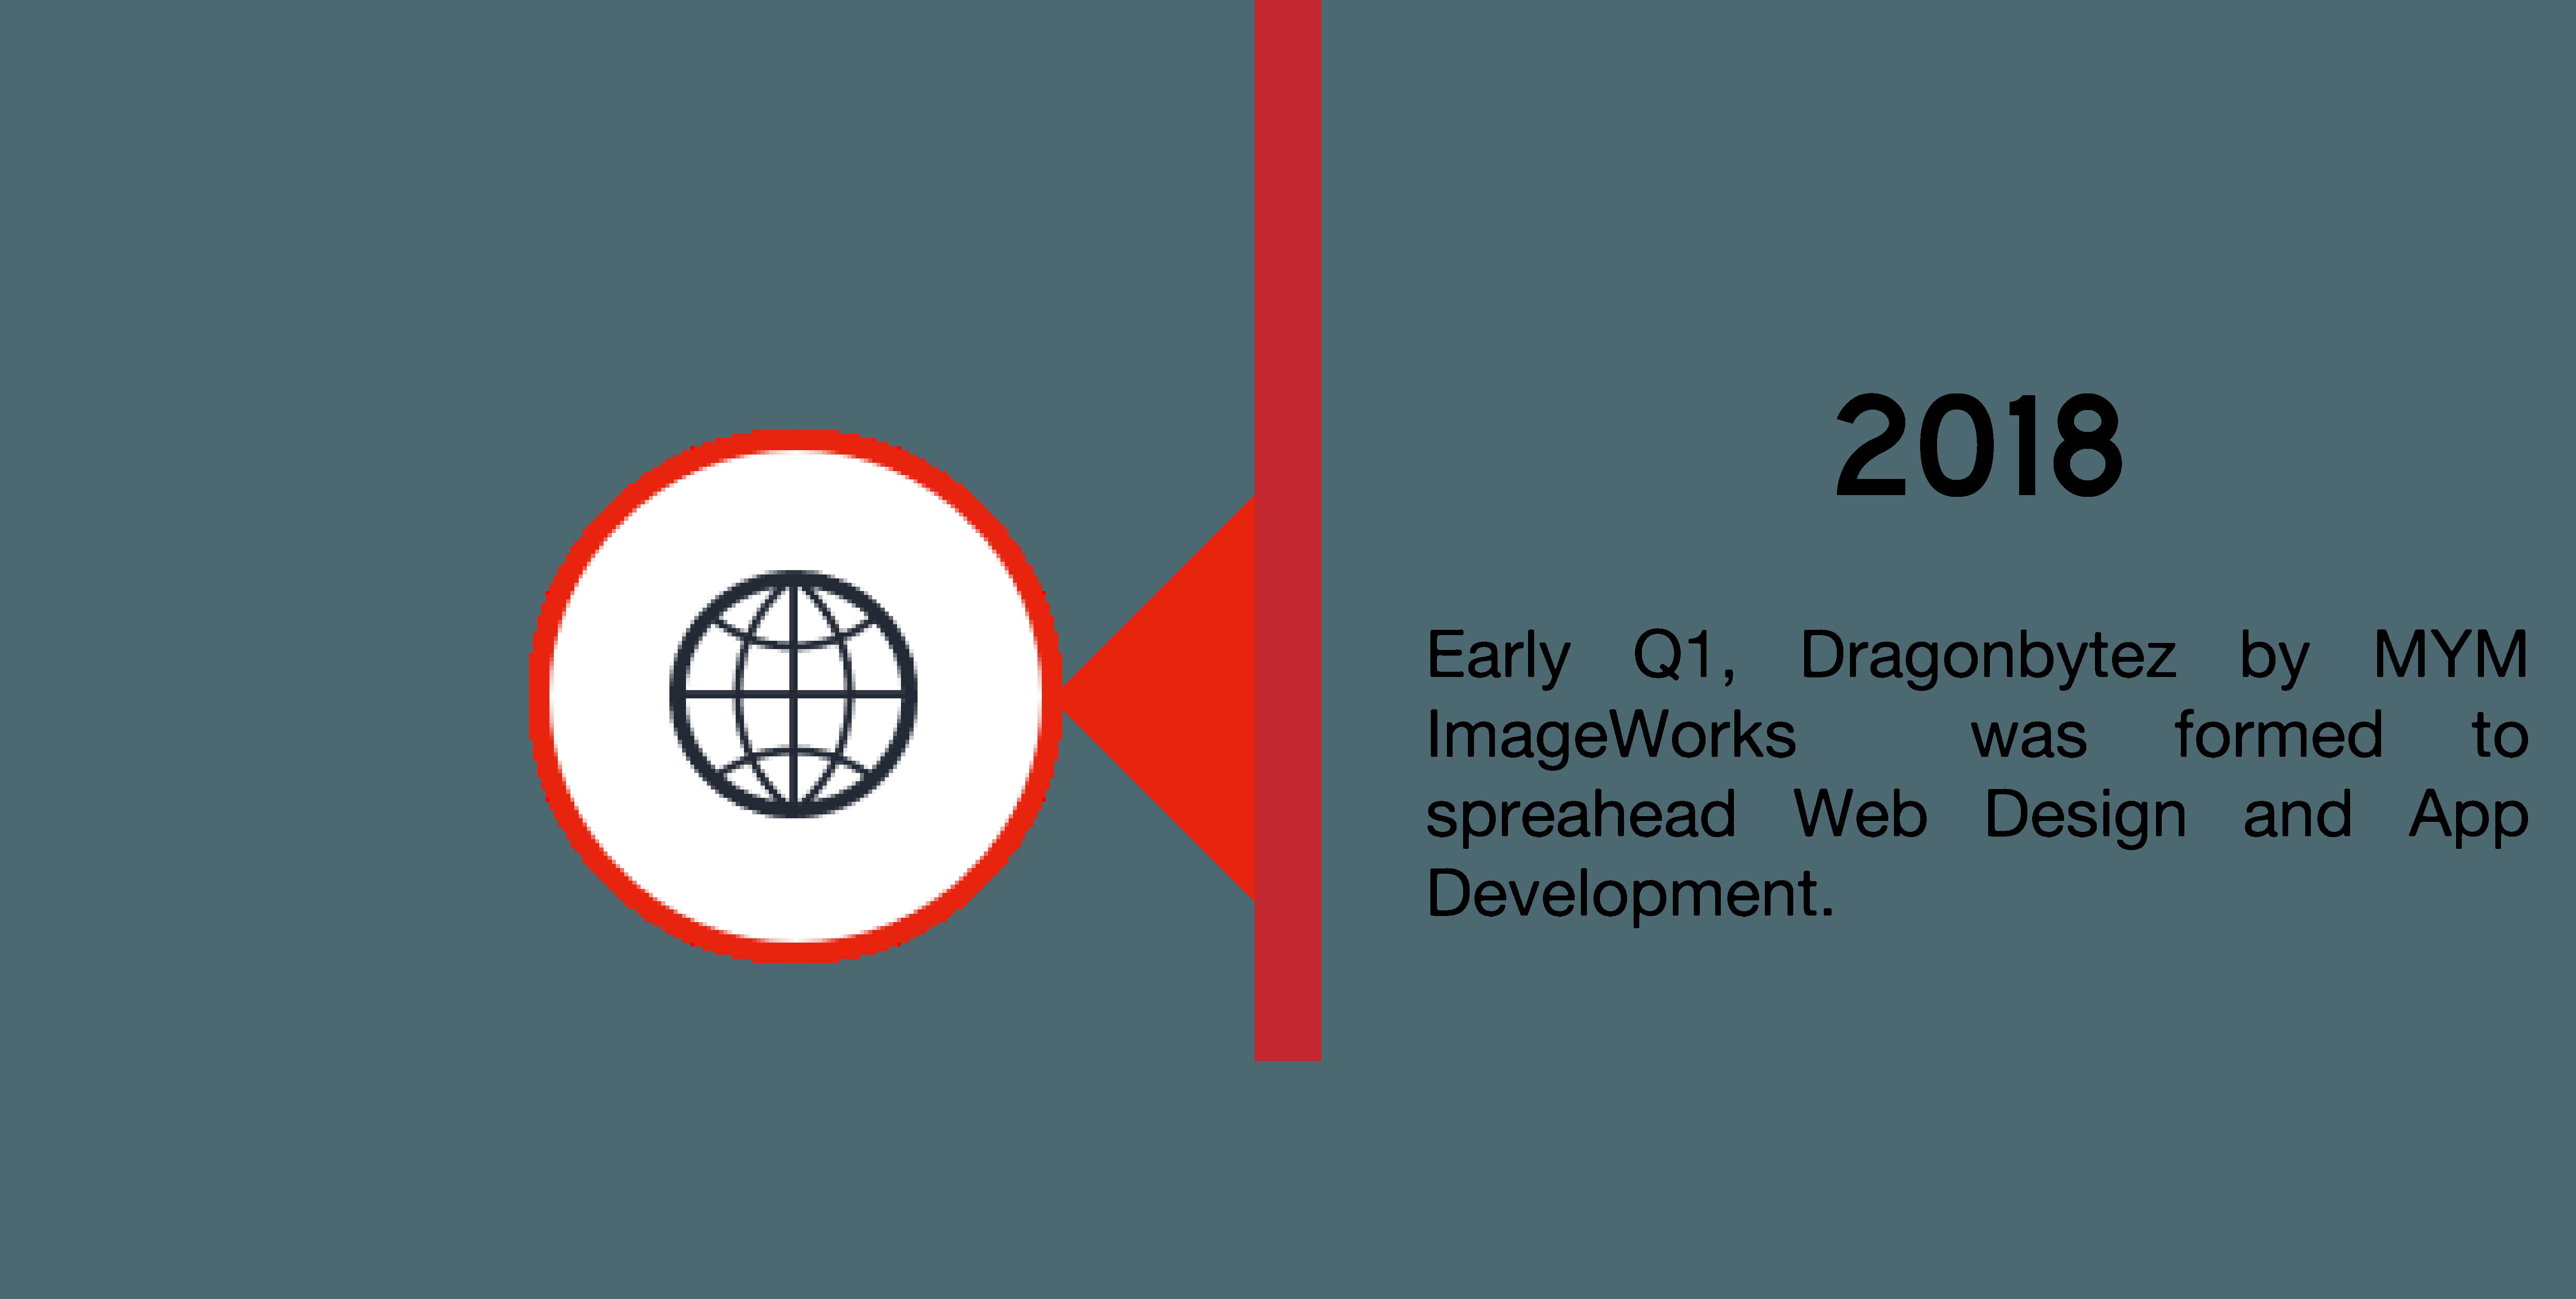 Dragonbytez 2018